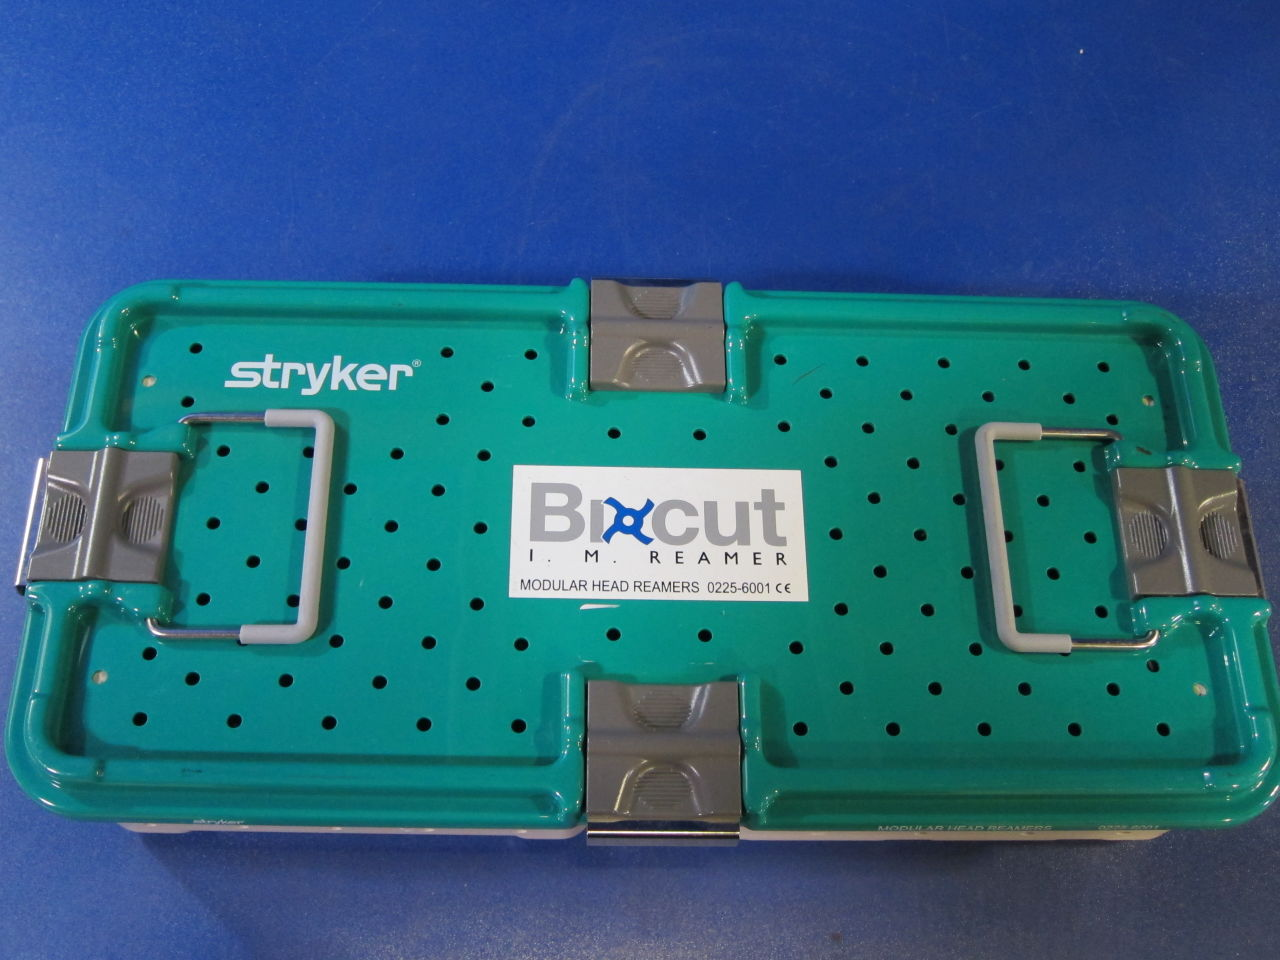 STRYKER BixCut Modular Head Reamers